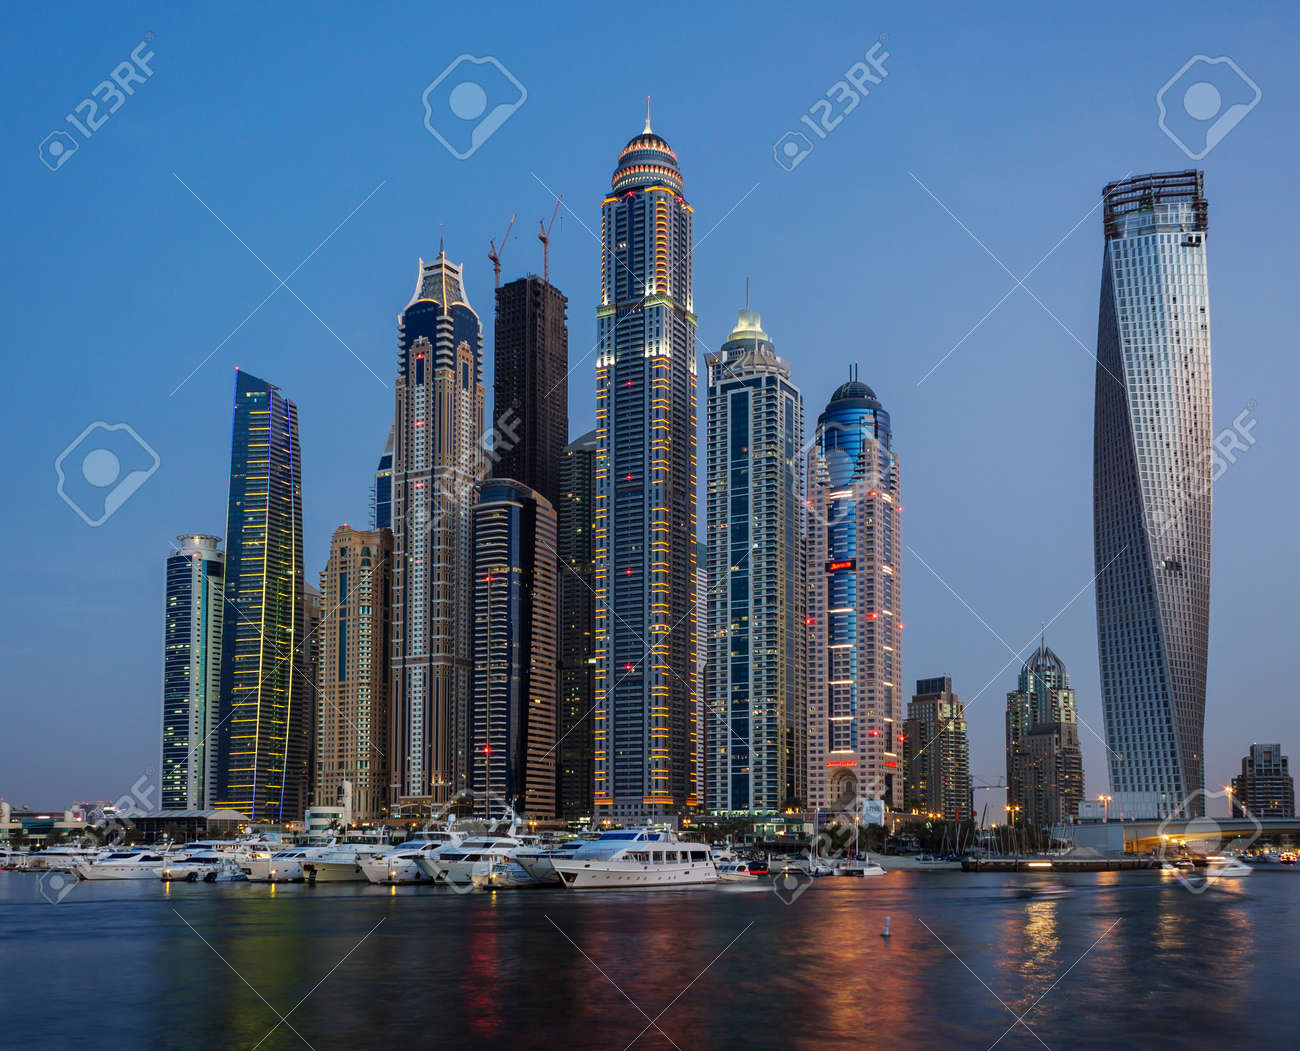 Dubai Marina at night, Dubai, UAE   Stock Photo - 17403299